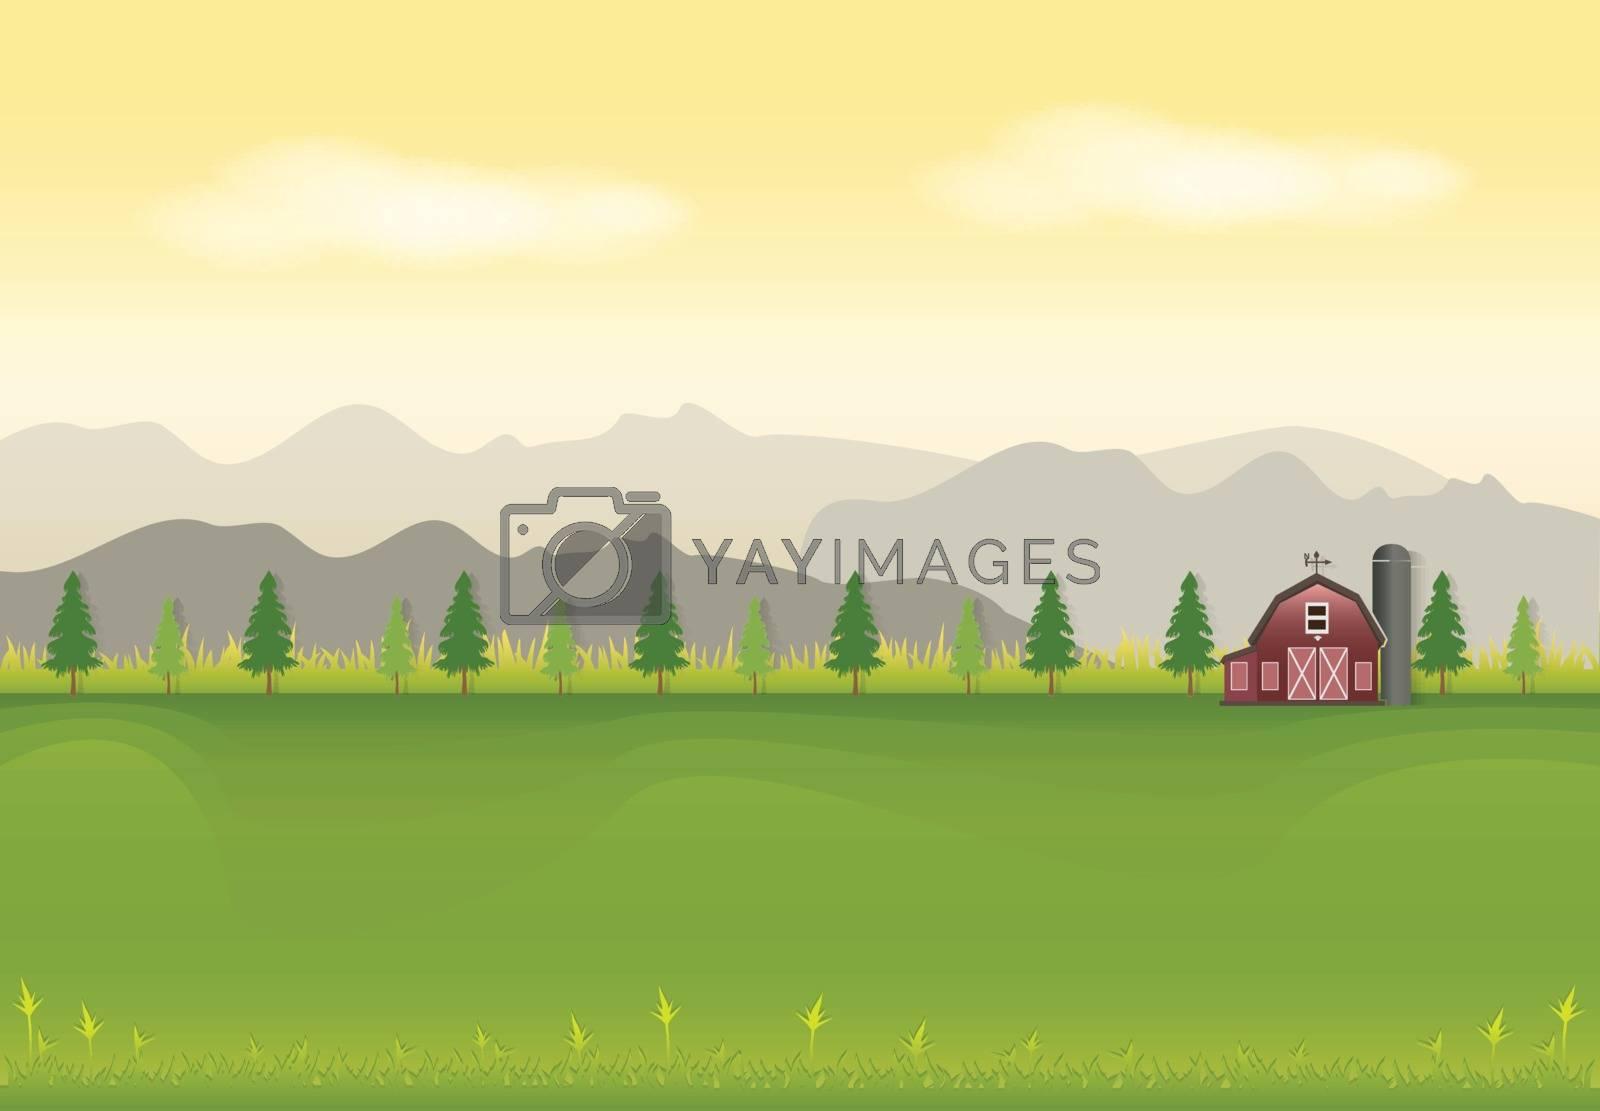 Red barn in field landscape background, paper art style illustration